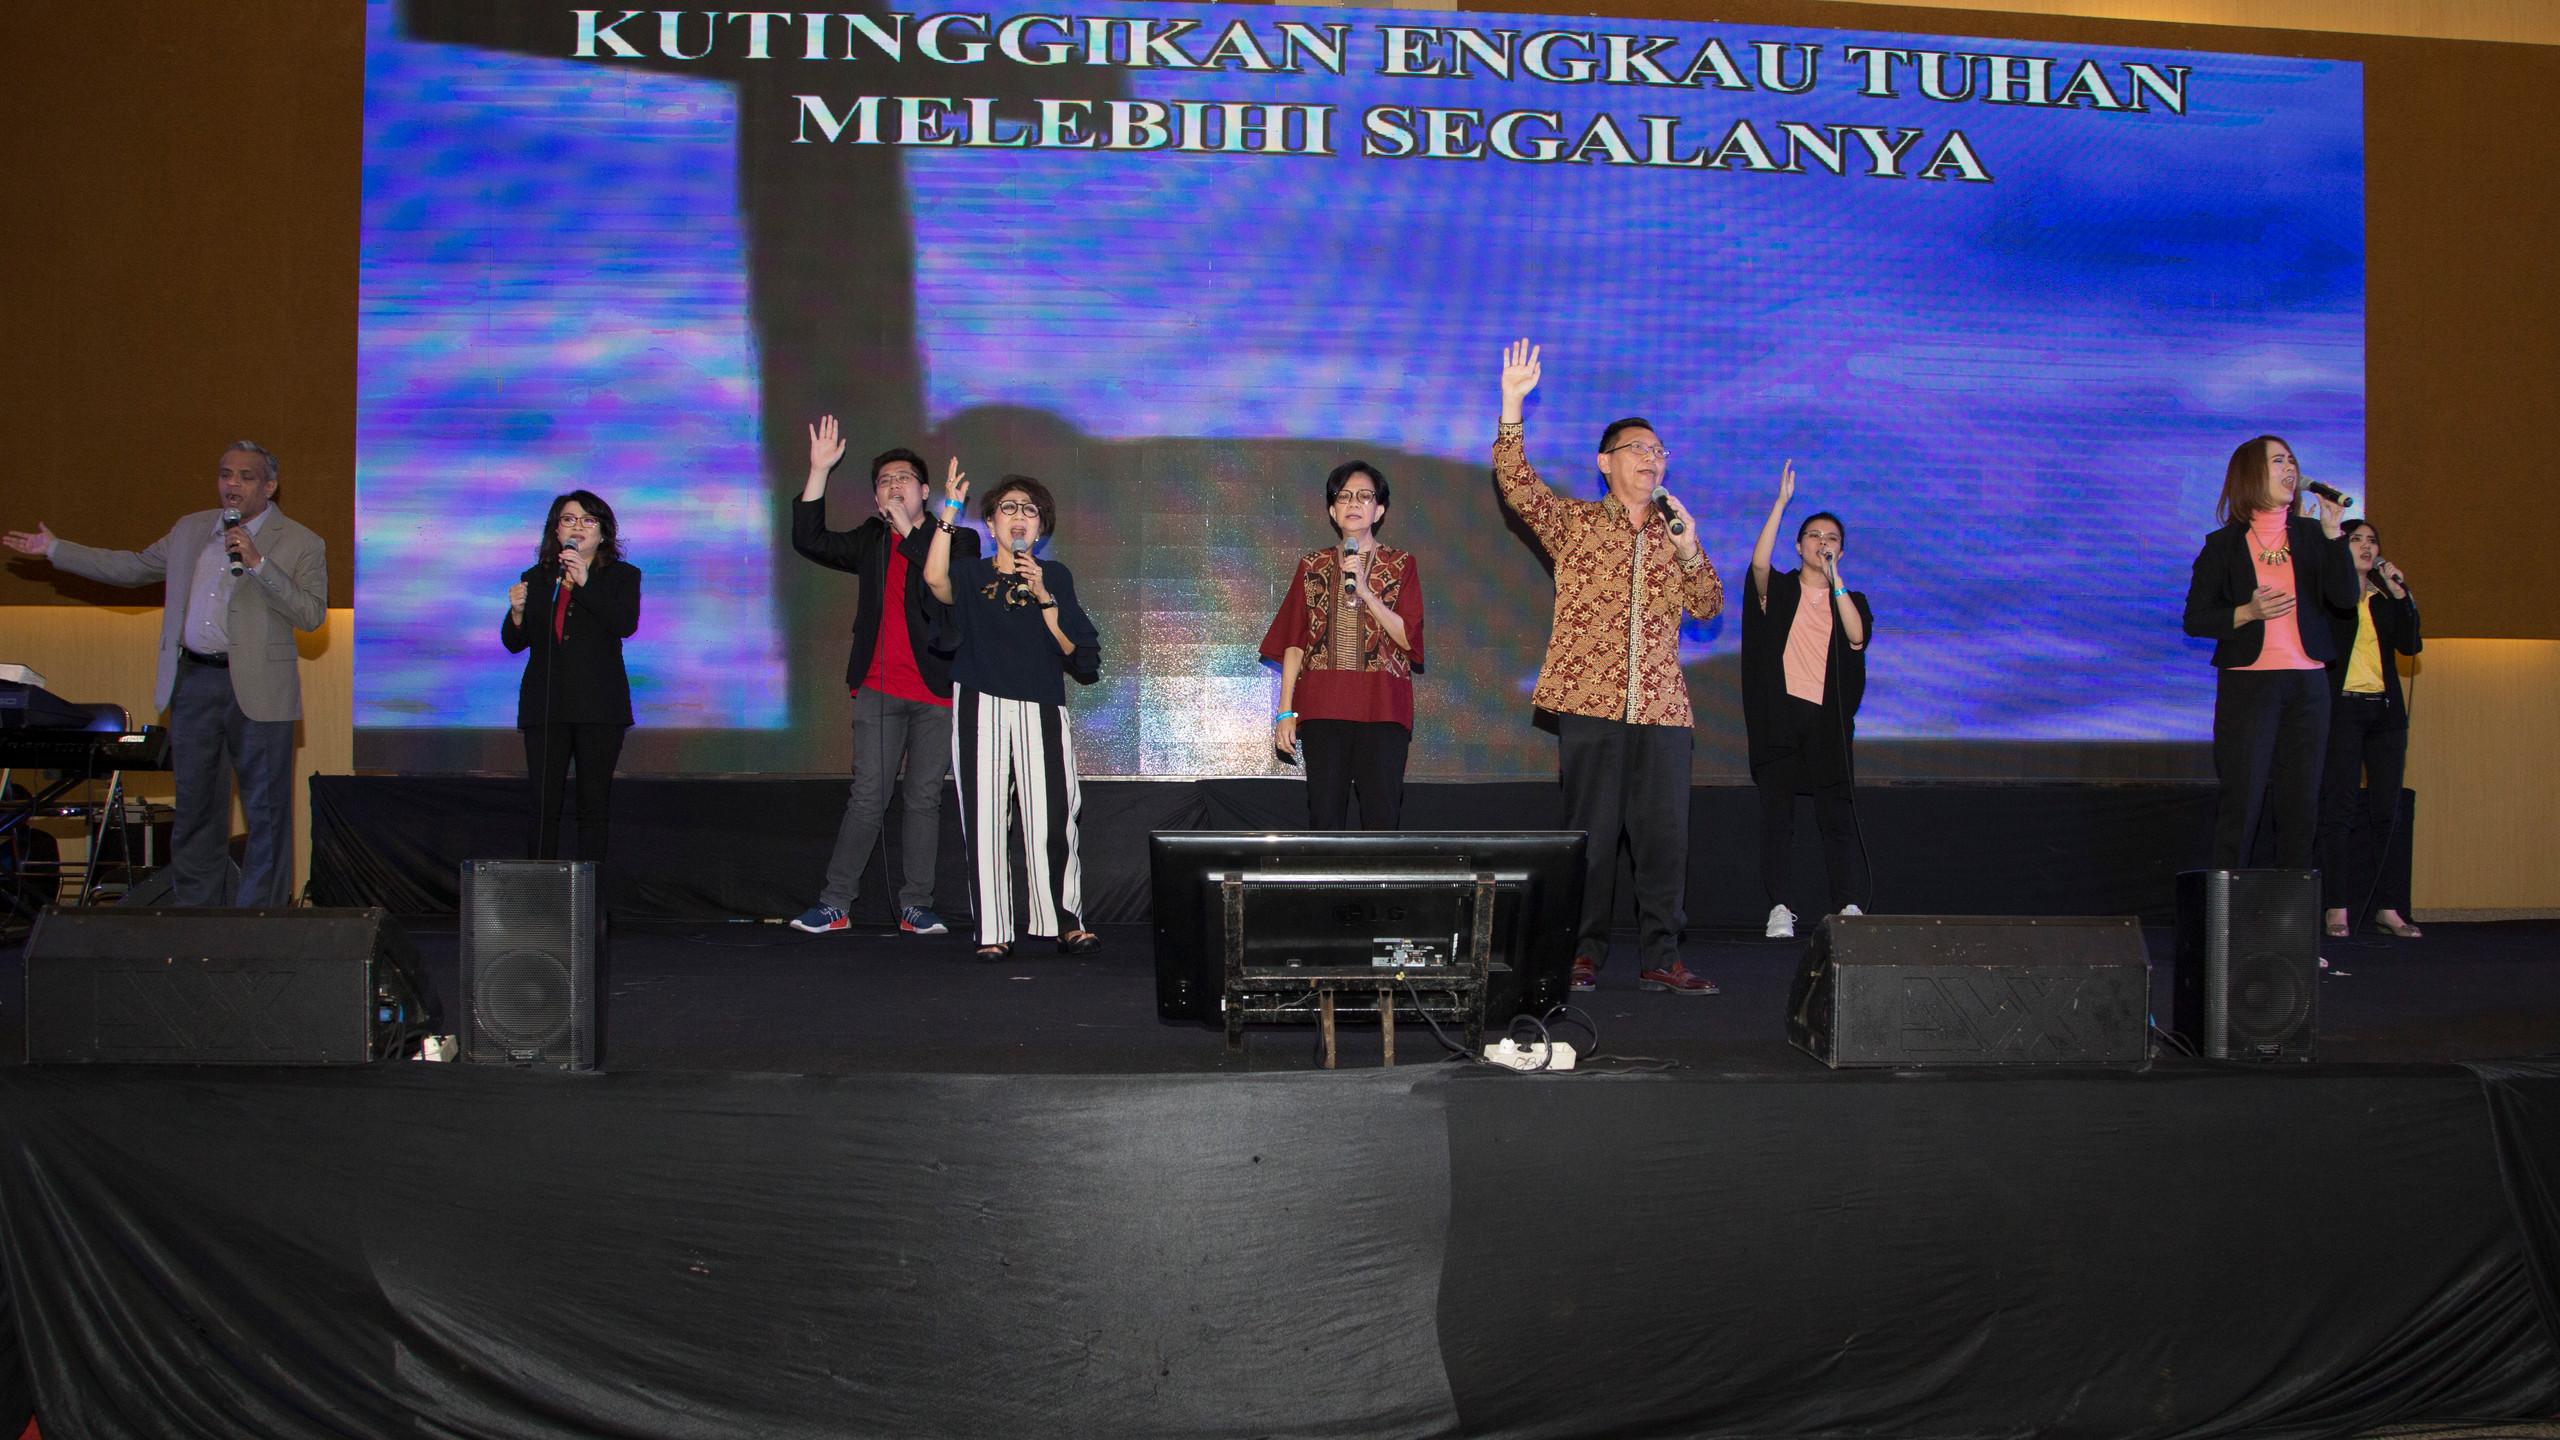 CRC 2018 Galaxy Mall Exhibition Center Surabaya 26 Mei 2018